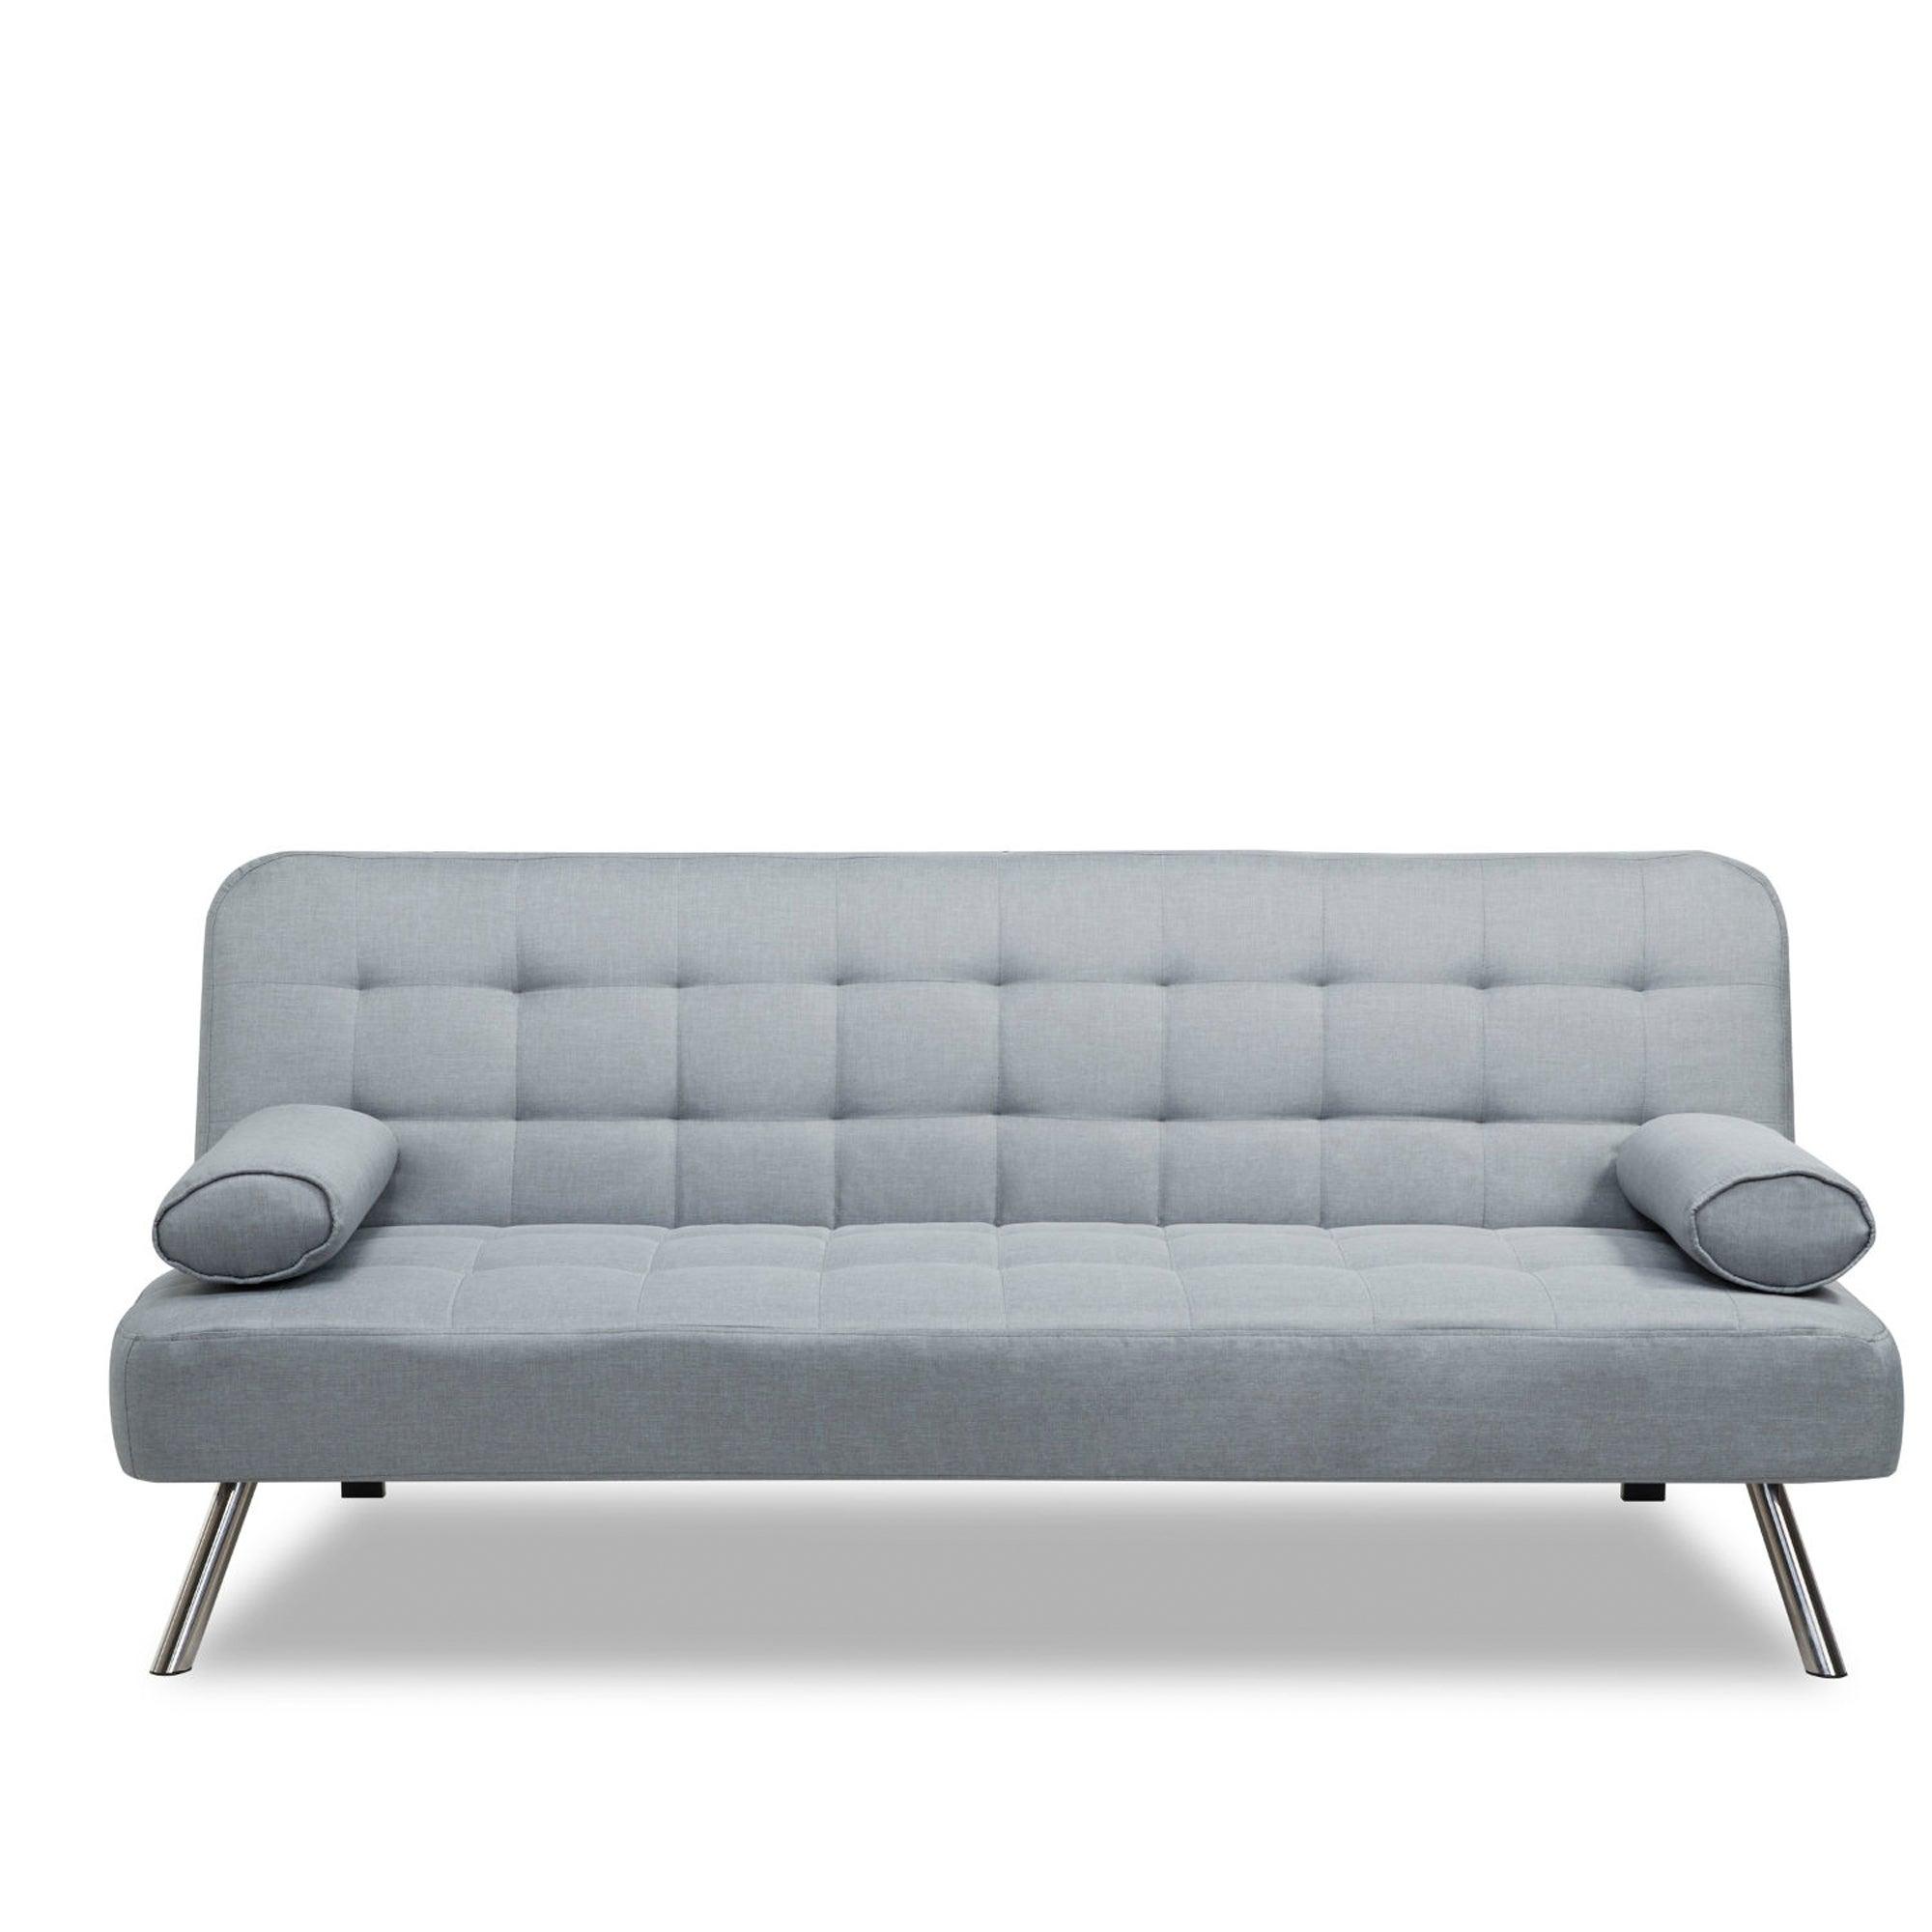 Tobi Fabric Sofa Bed Light Grey